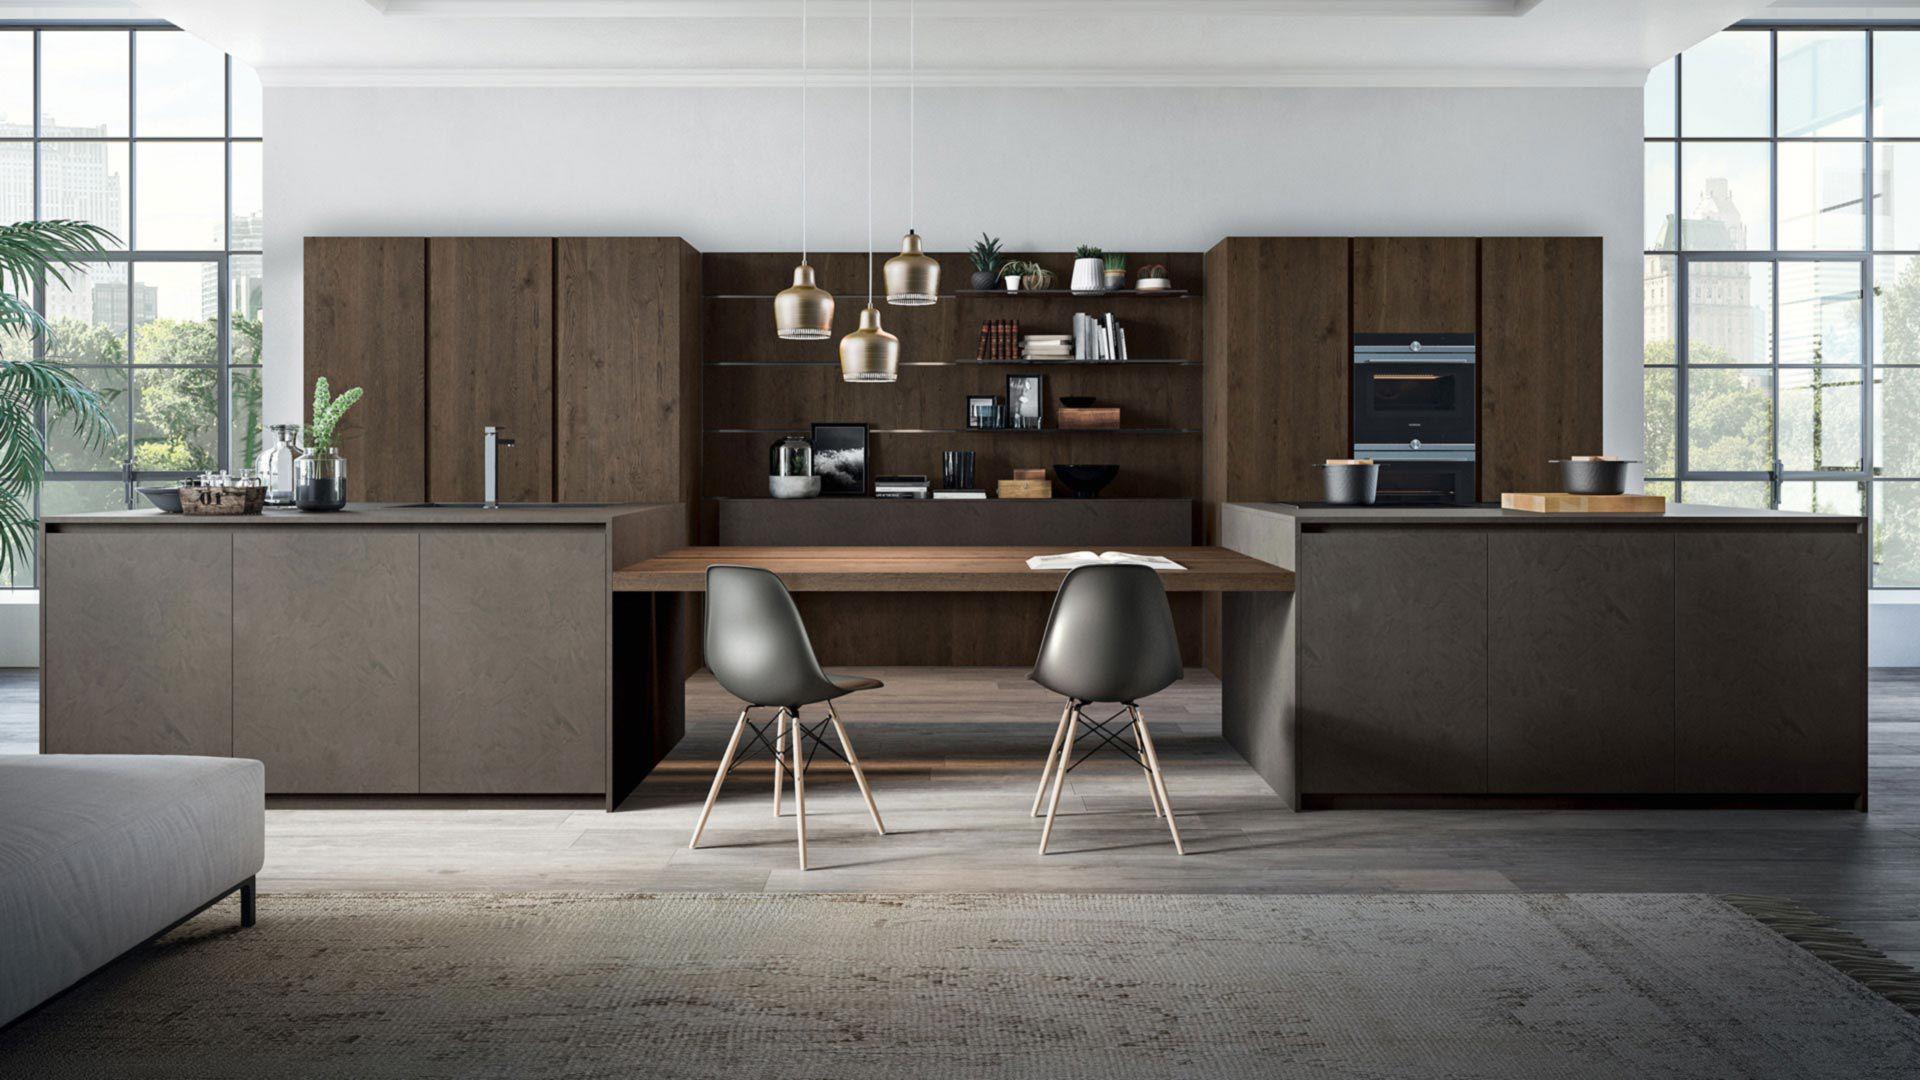 Cucina moderna / in legno / in resina / con isola - OMICRON 22 ...